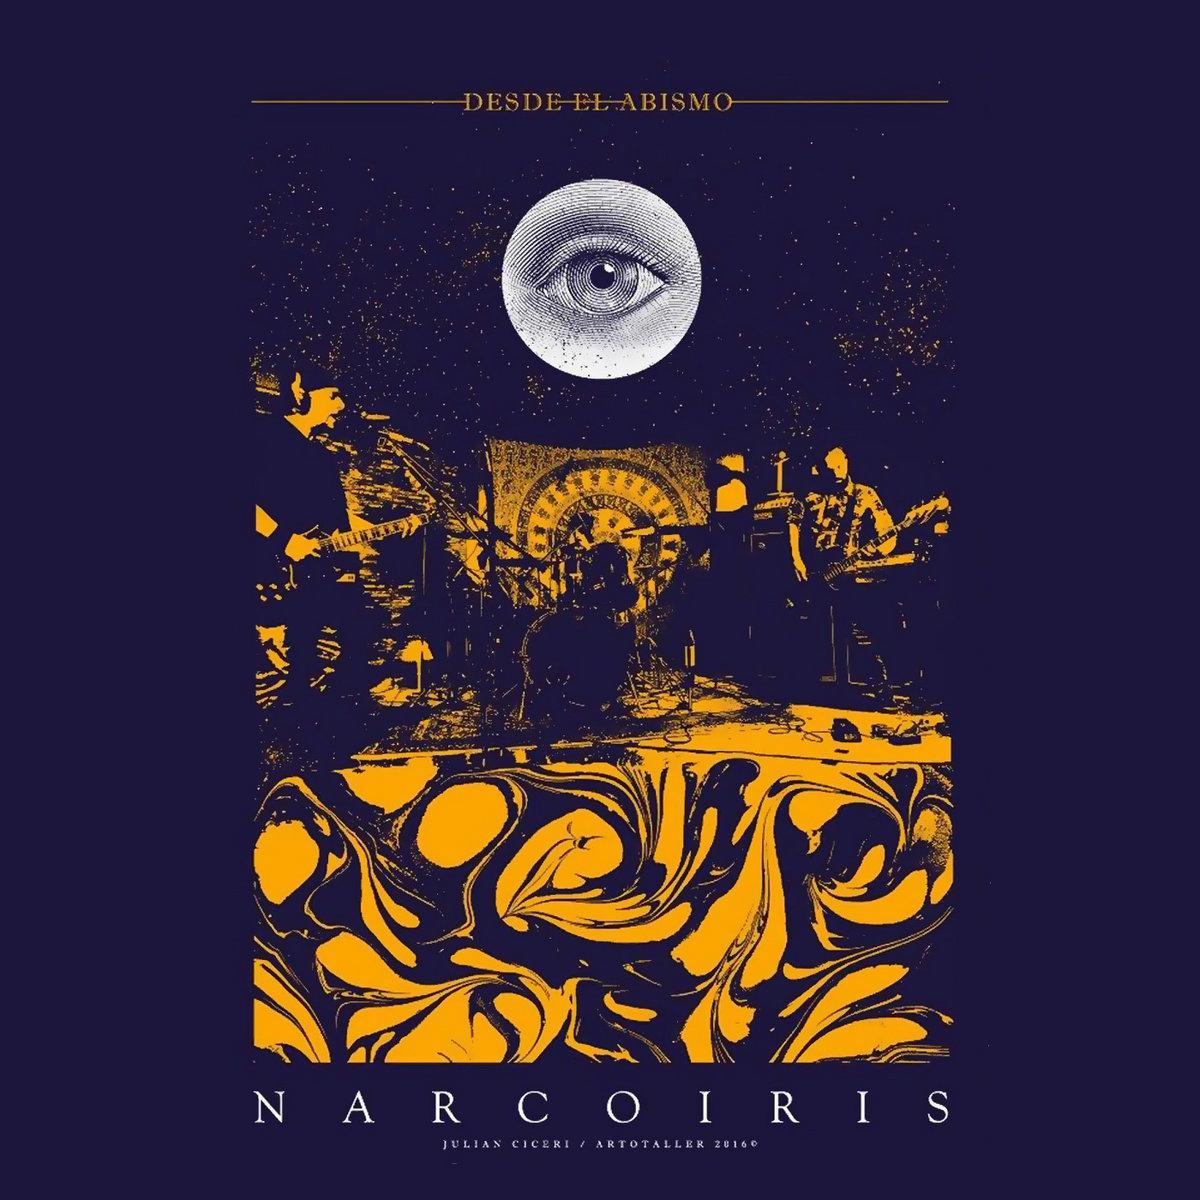 https://narcoiris.bandcamp.com/album/desde-el-abismo